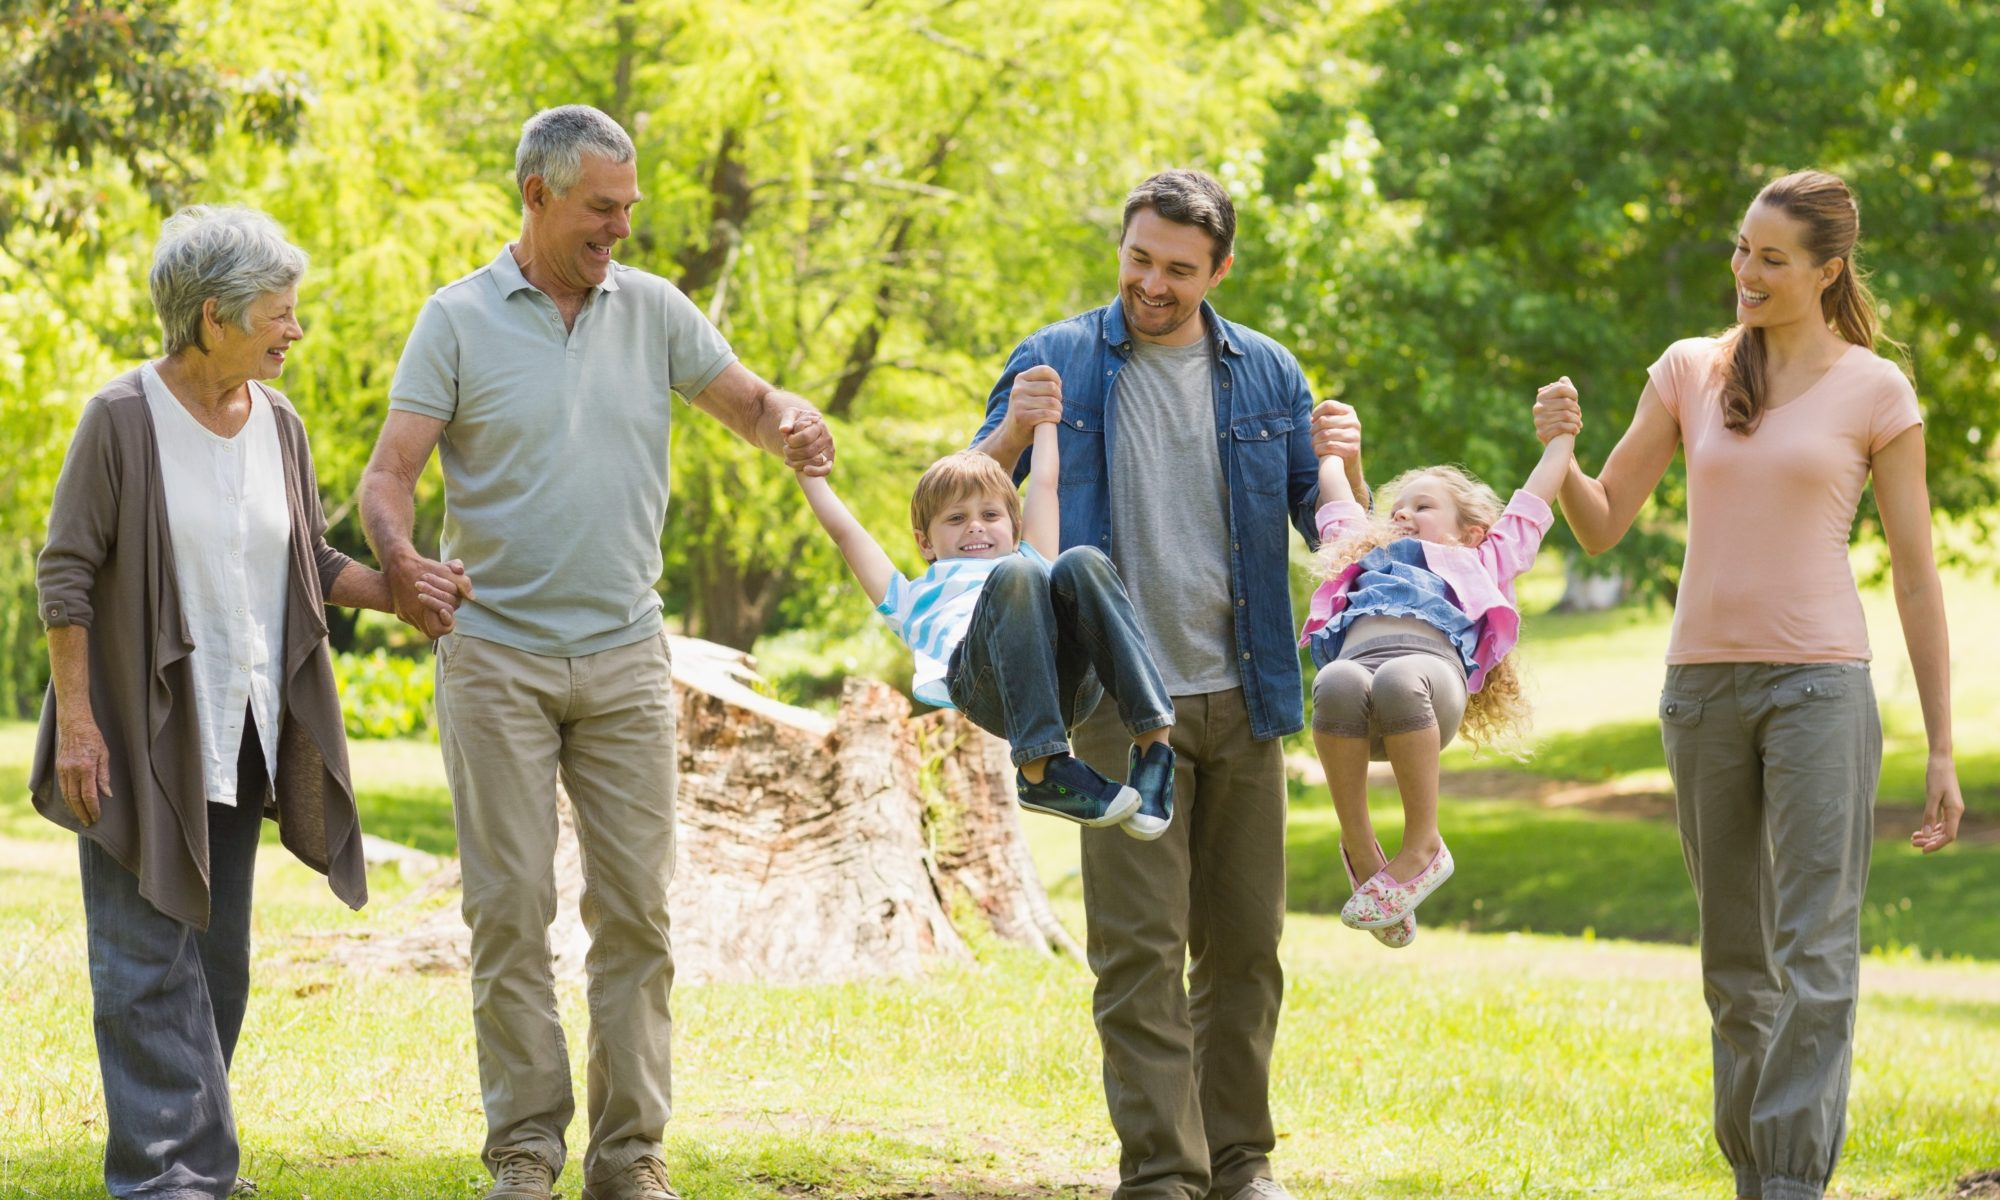 Foothills Chiropractic - Best Massage & Chiropractic in Carefree